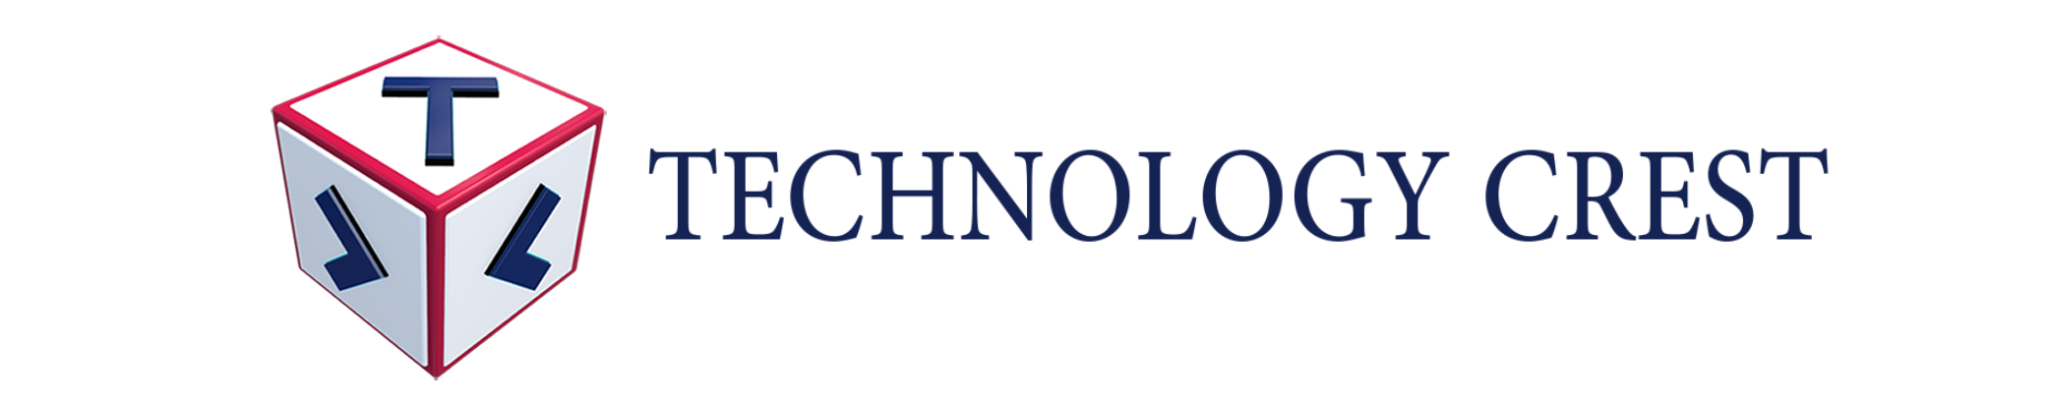 Technology Crest